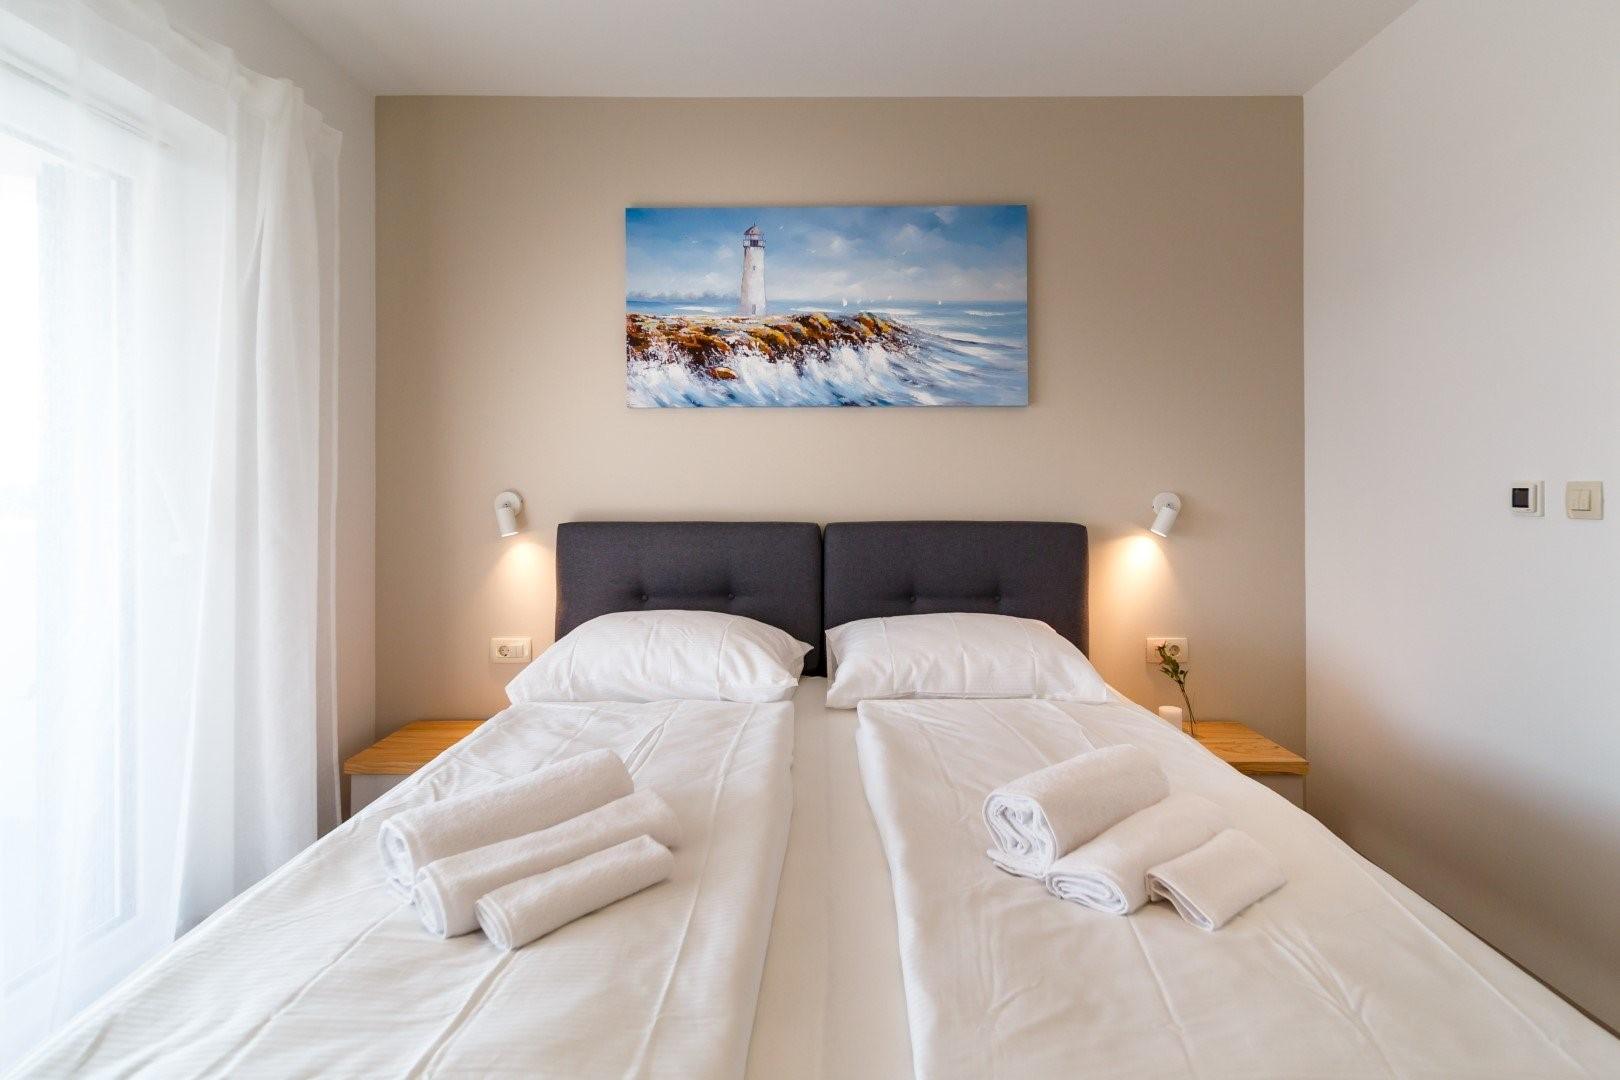 Ferienhaus Luxury Villa Loma 2 (2586643), Sveti Vid-Miholjice, Insel Krk, Kvarner, Kroatien, Bild 11